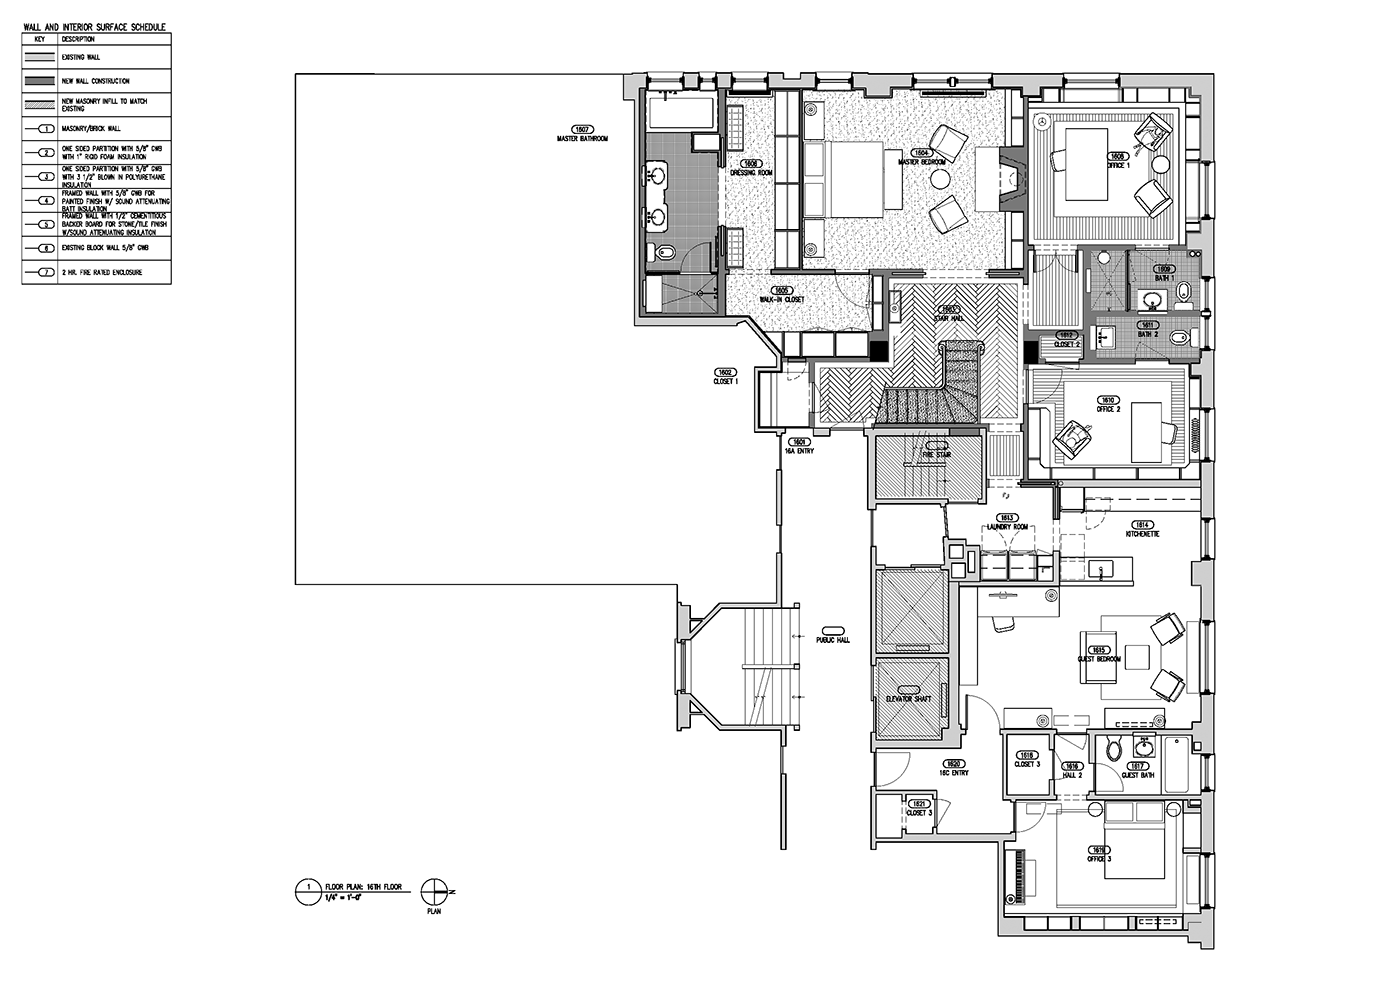 A211_Floor Plan_16th Floor A410 (1).png